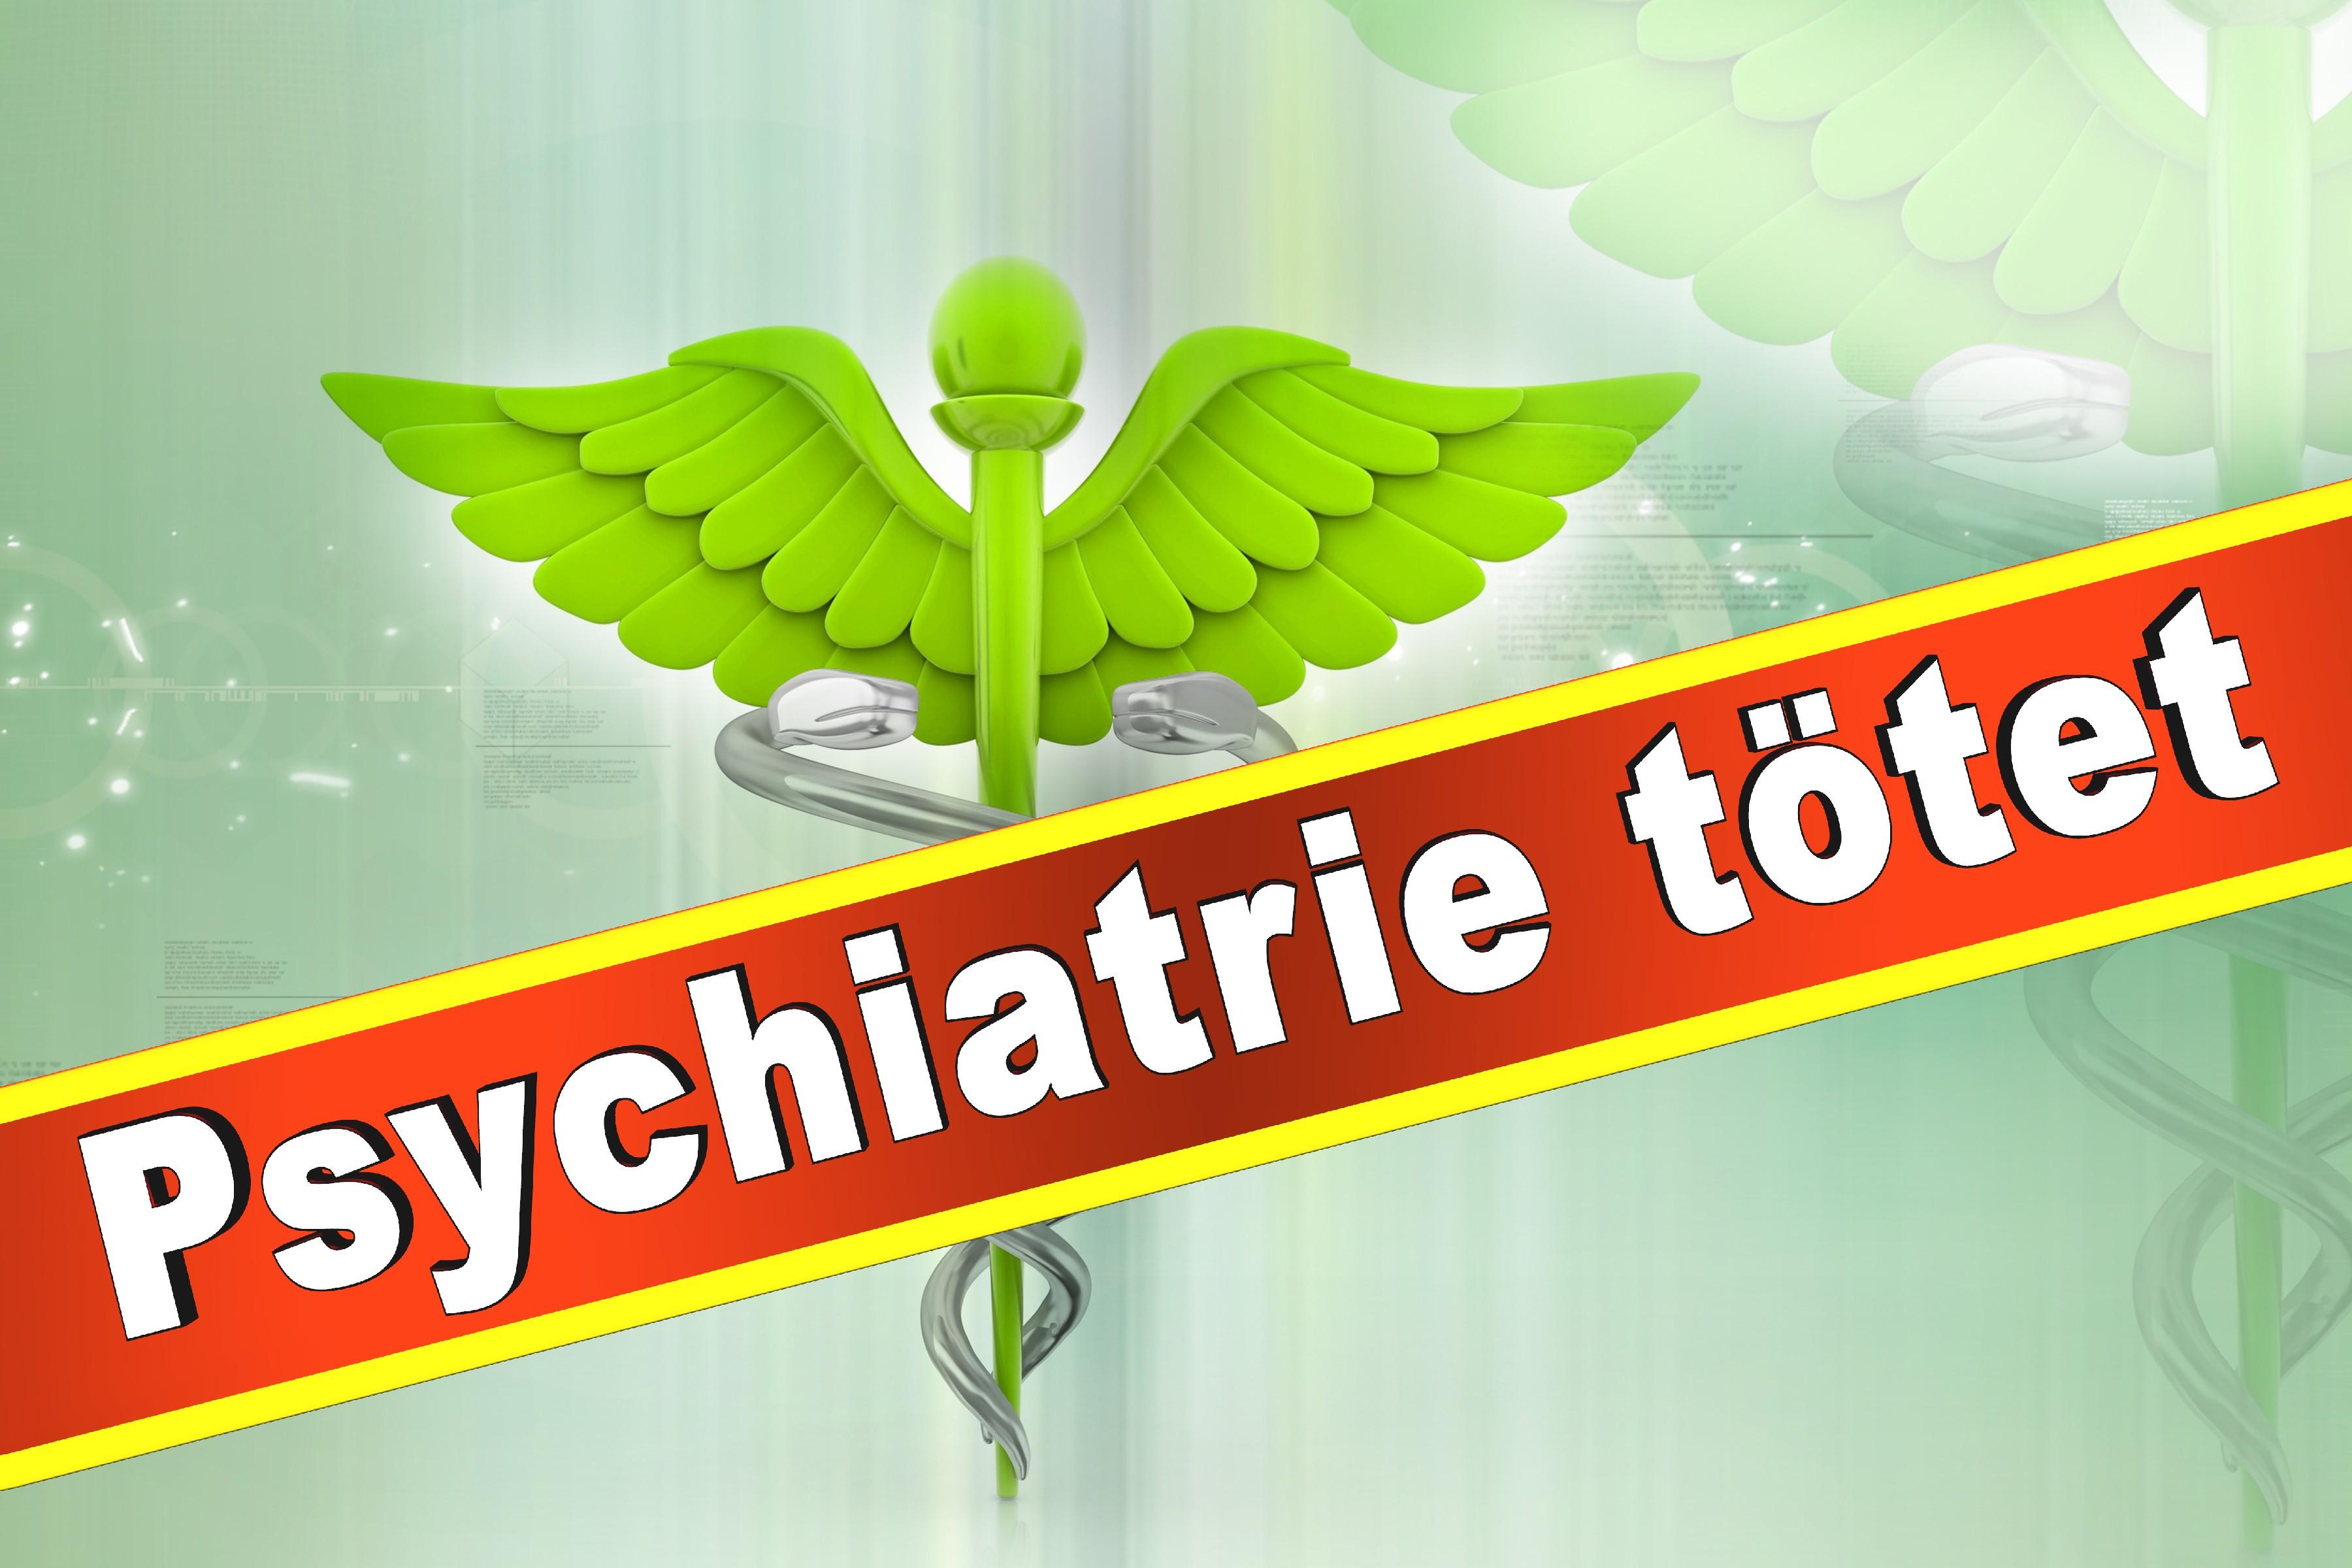 Praxis Nadine Buddensiek Psychotherapeut Hannover Gutachten Psychiater Facharzt Psychiatrie